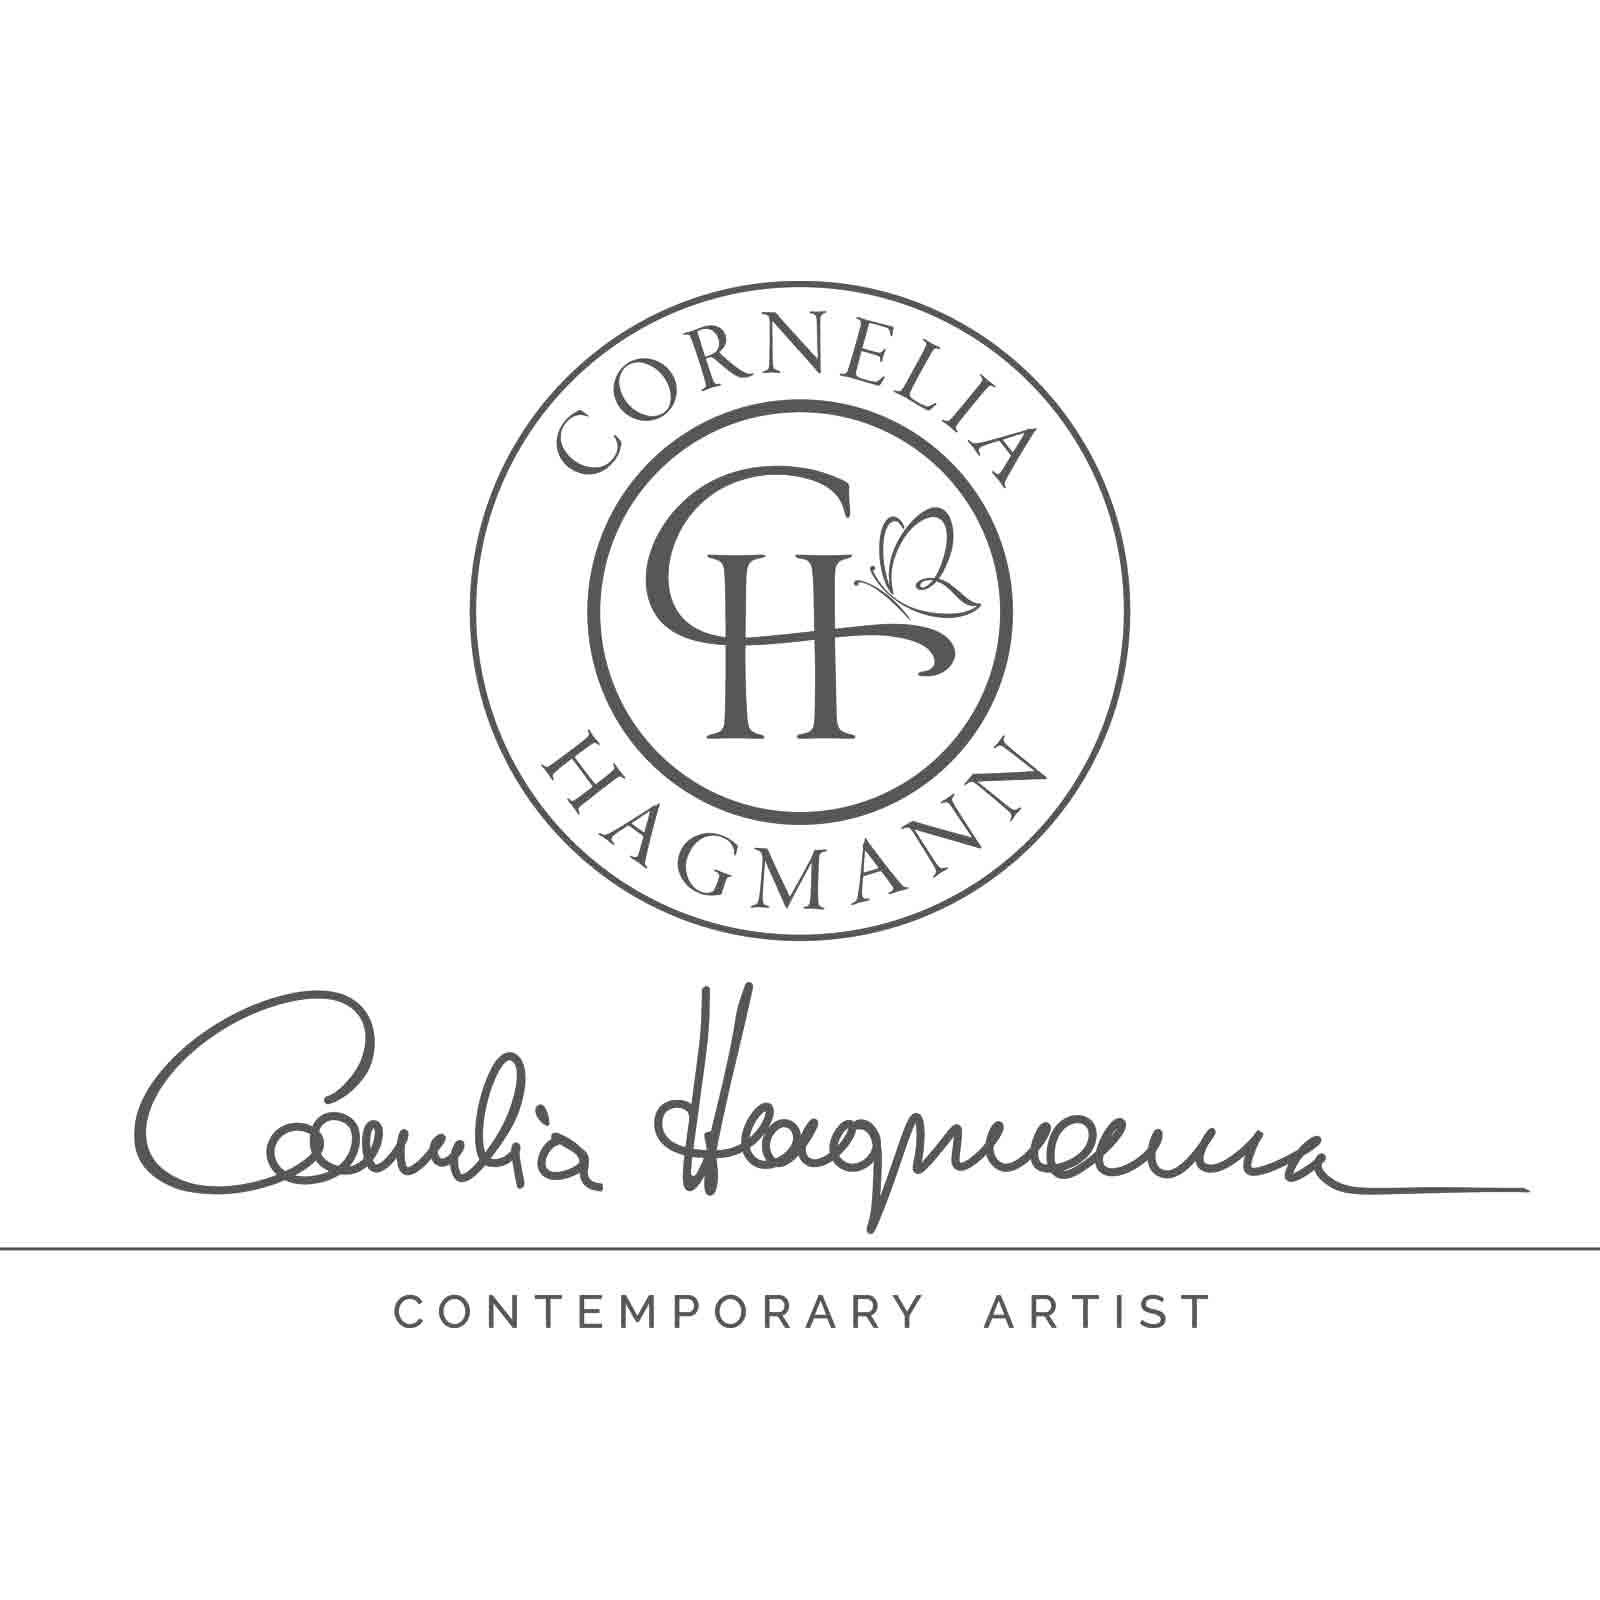 Cornelia Hagmann Contemporary Artist Webagentur Logo ShowMyProject Basel